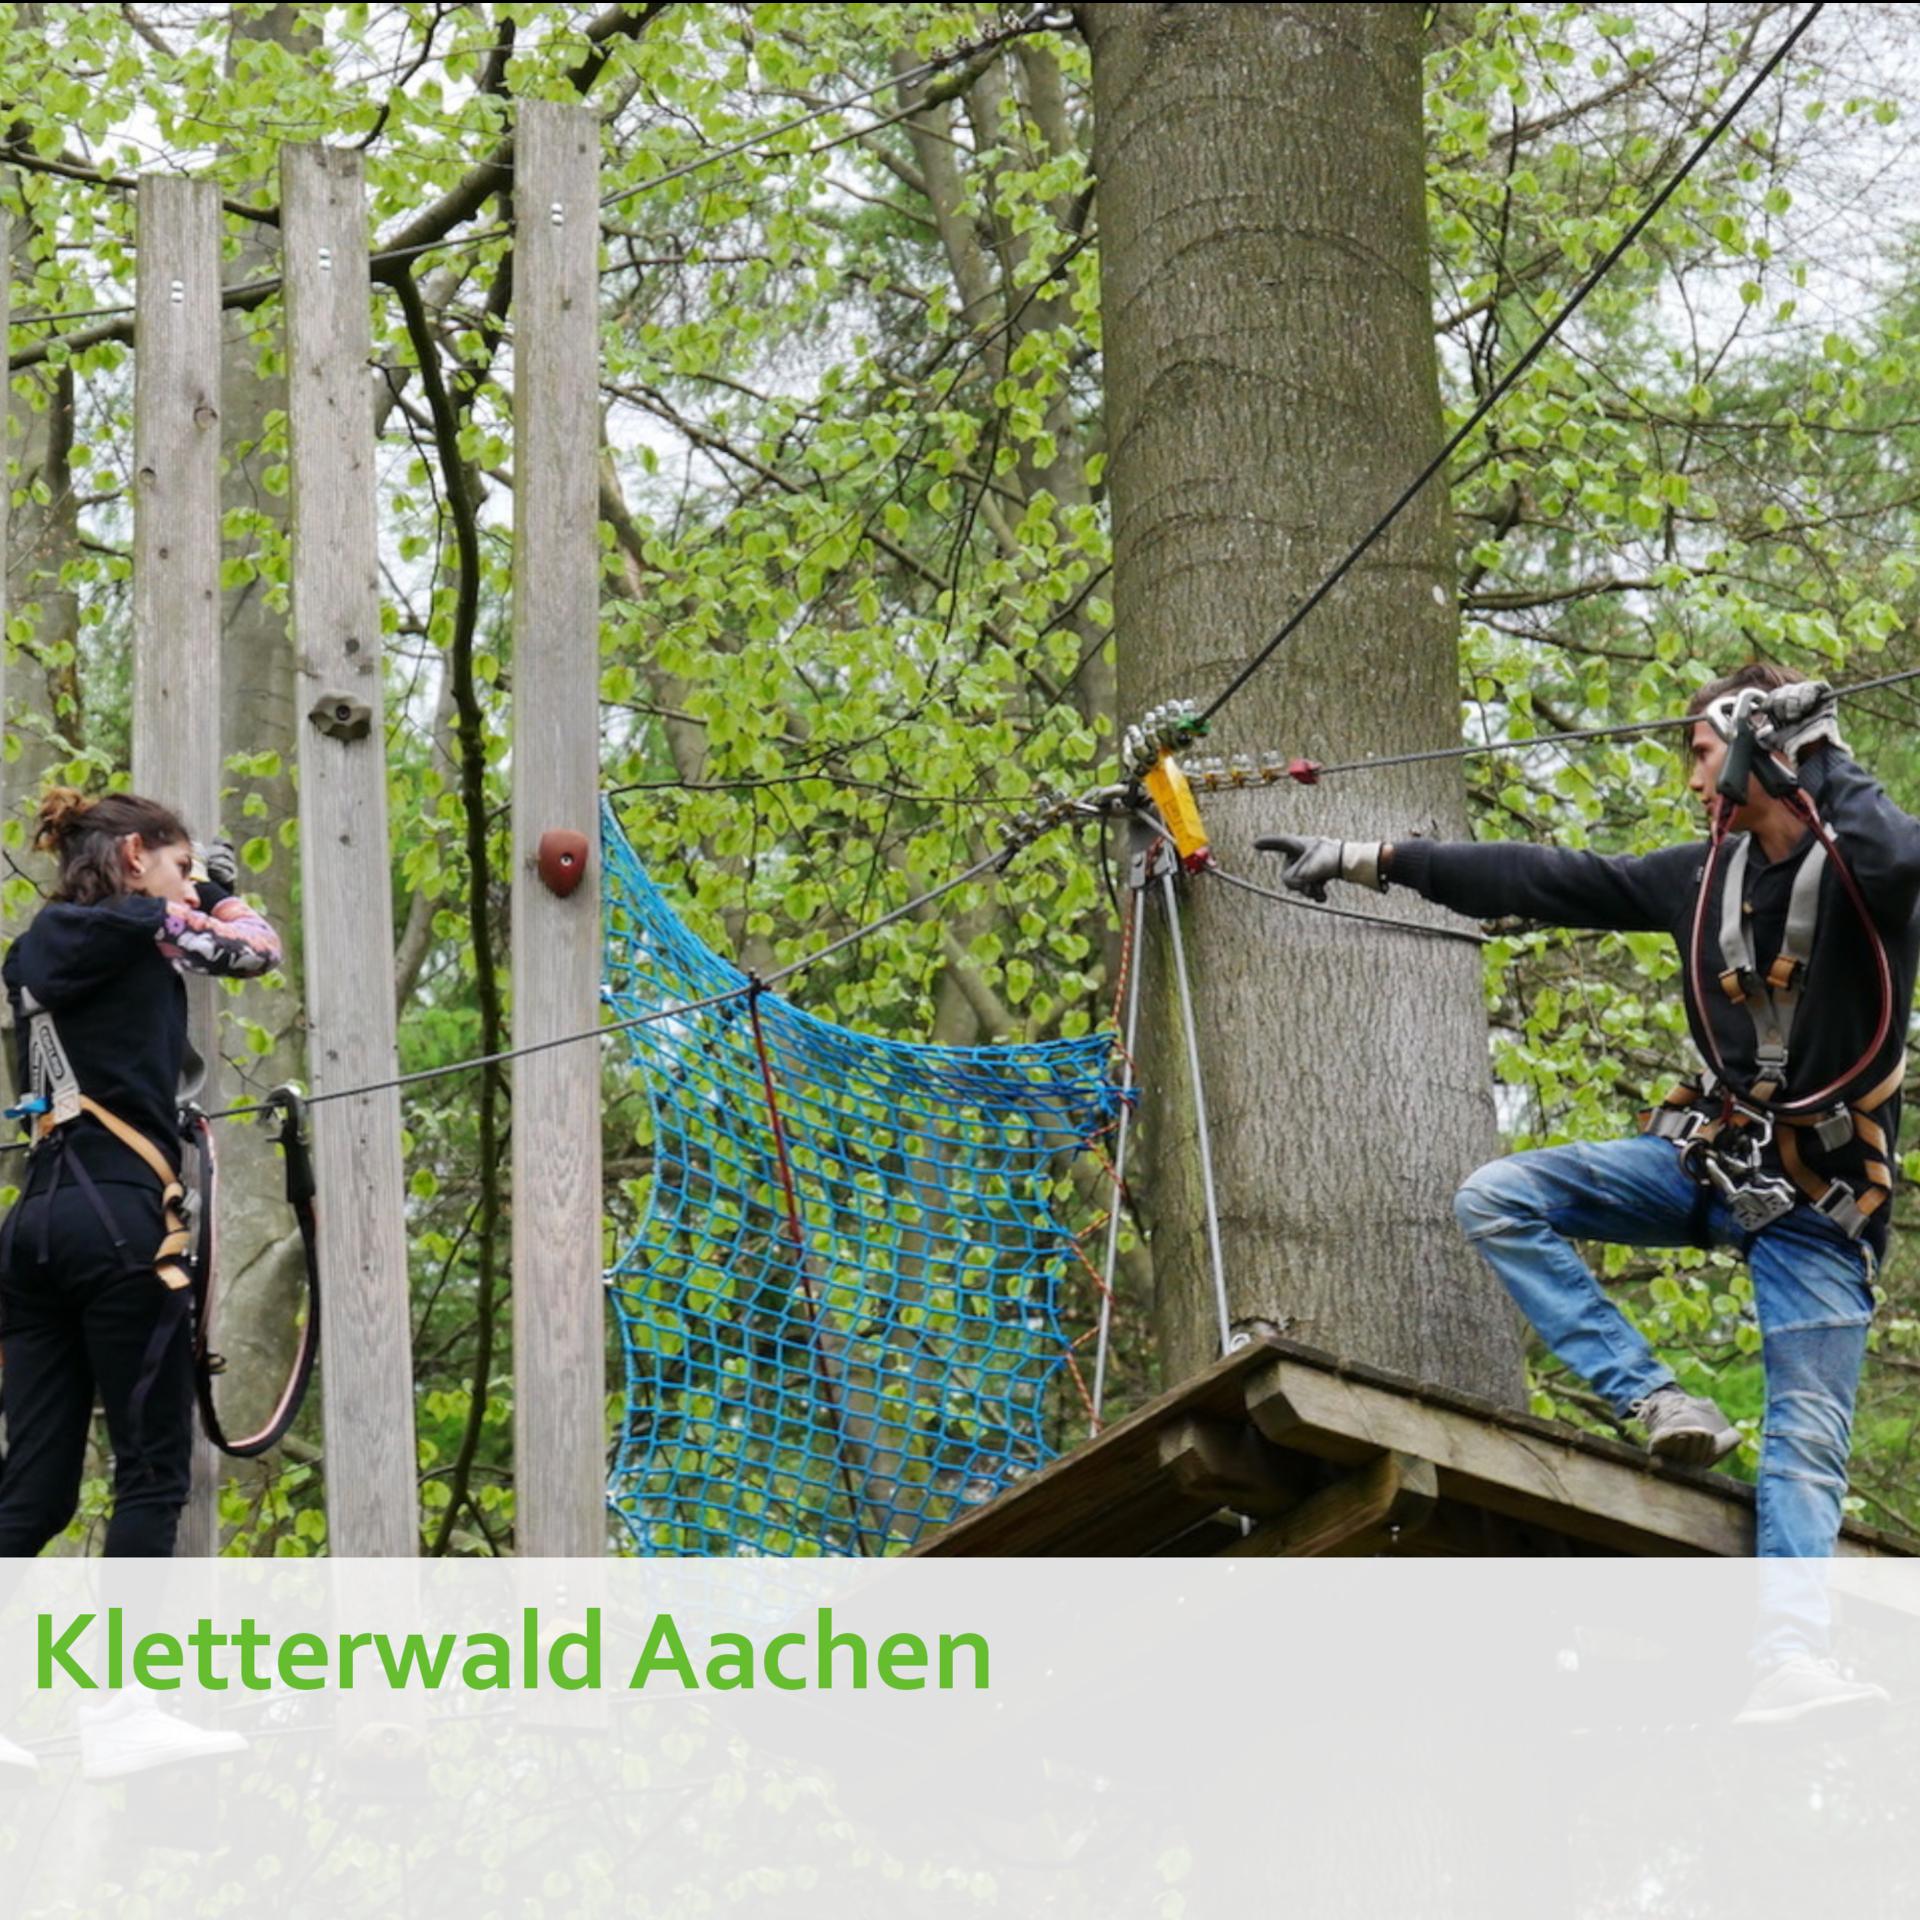 Kletterwald Aachen